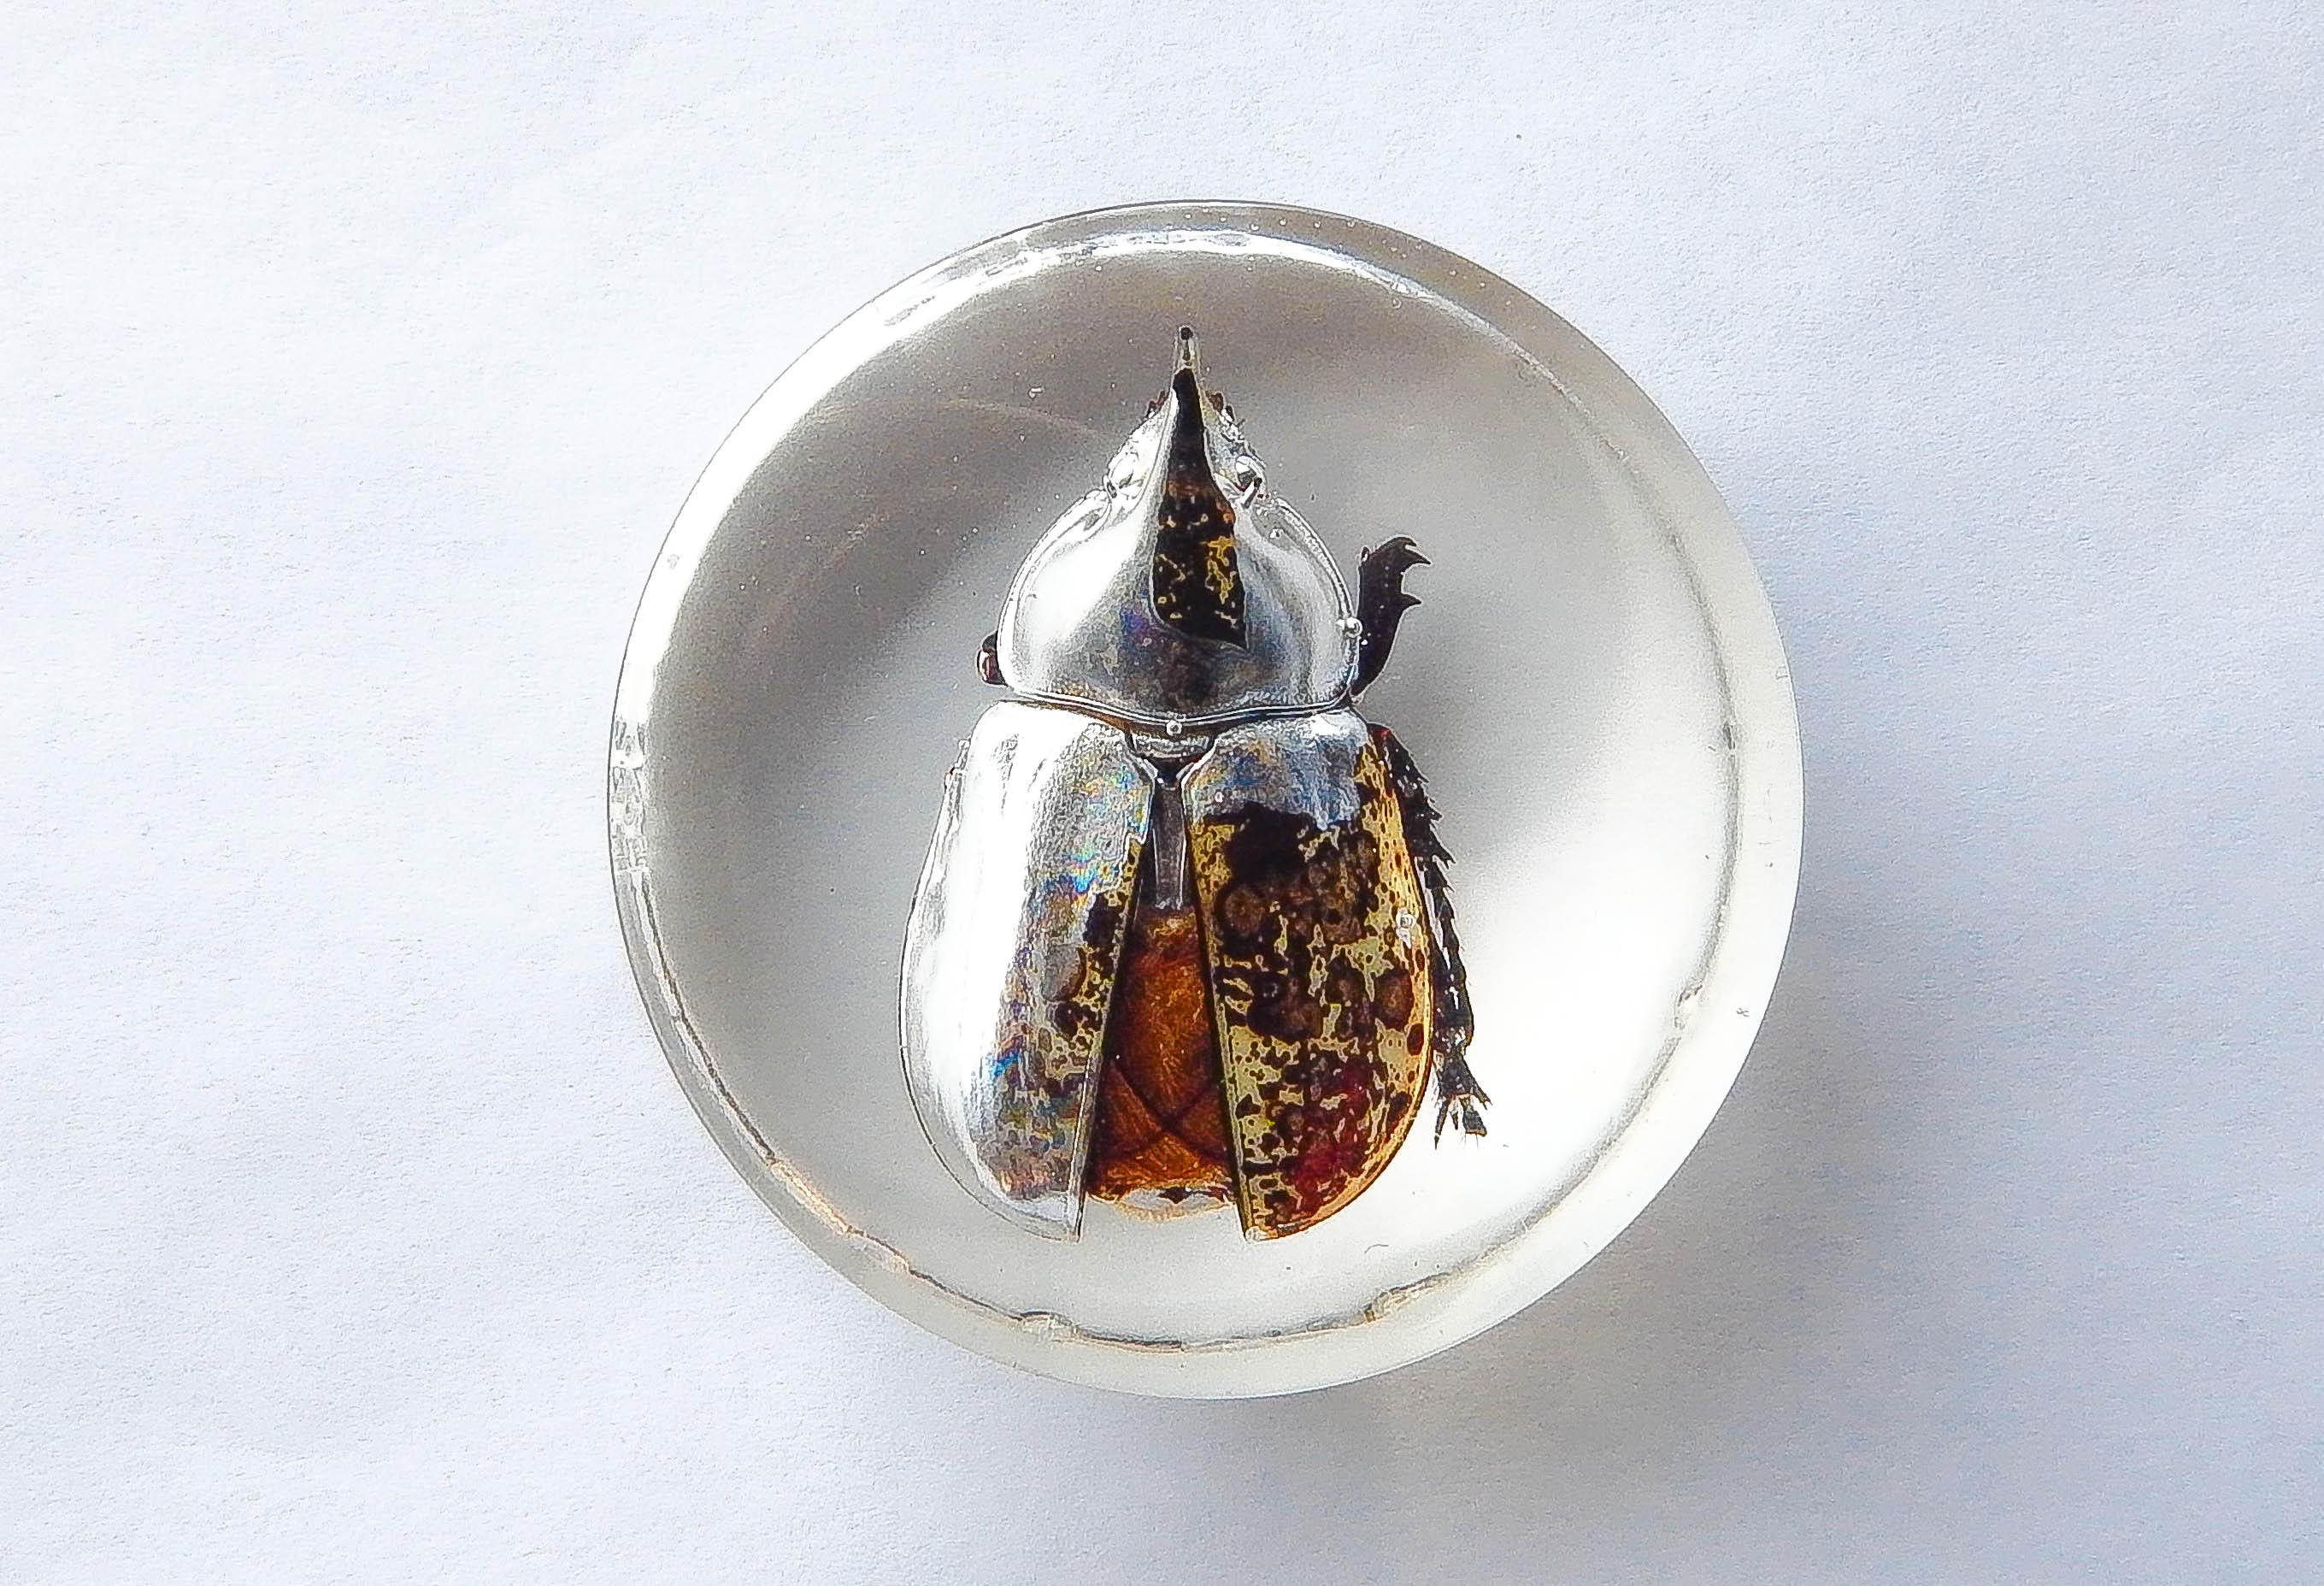 Hercules Beetle Resin Paperweight • The Dro